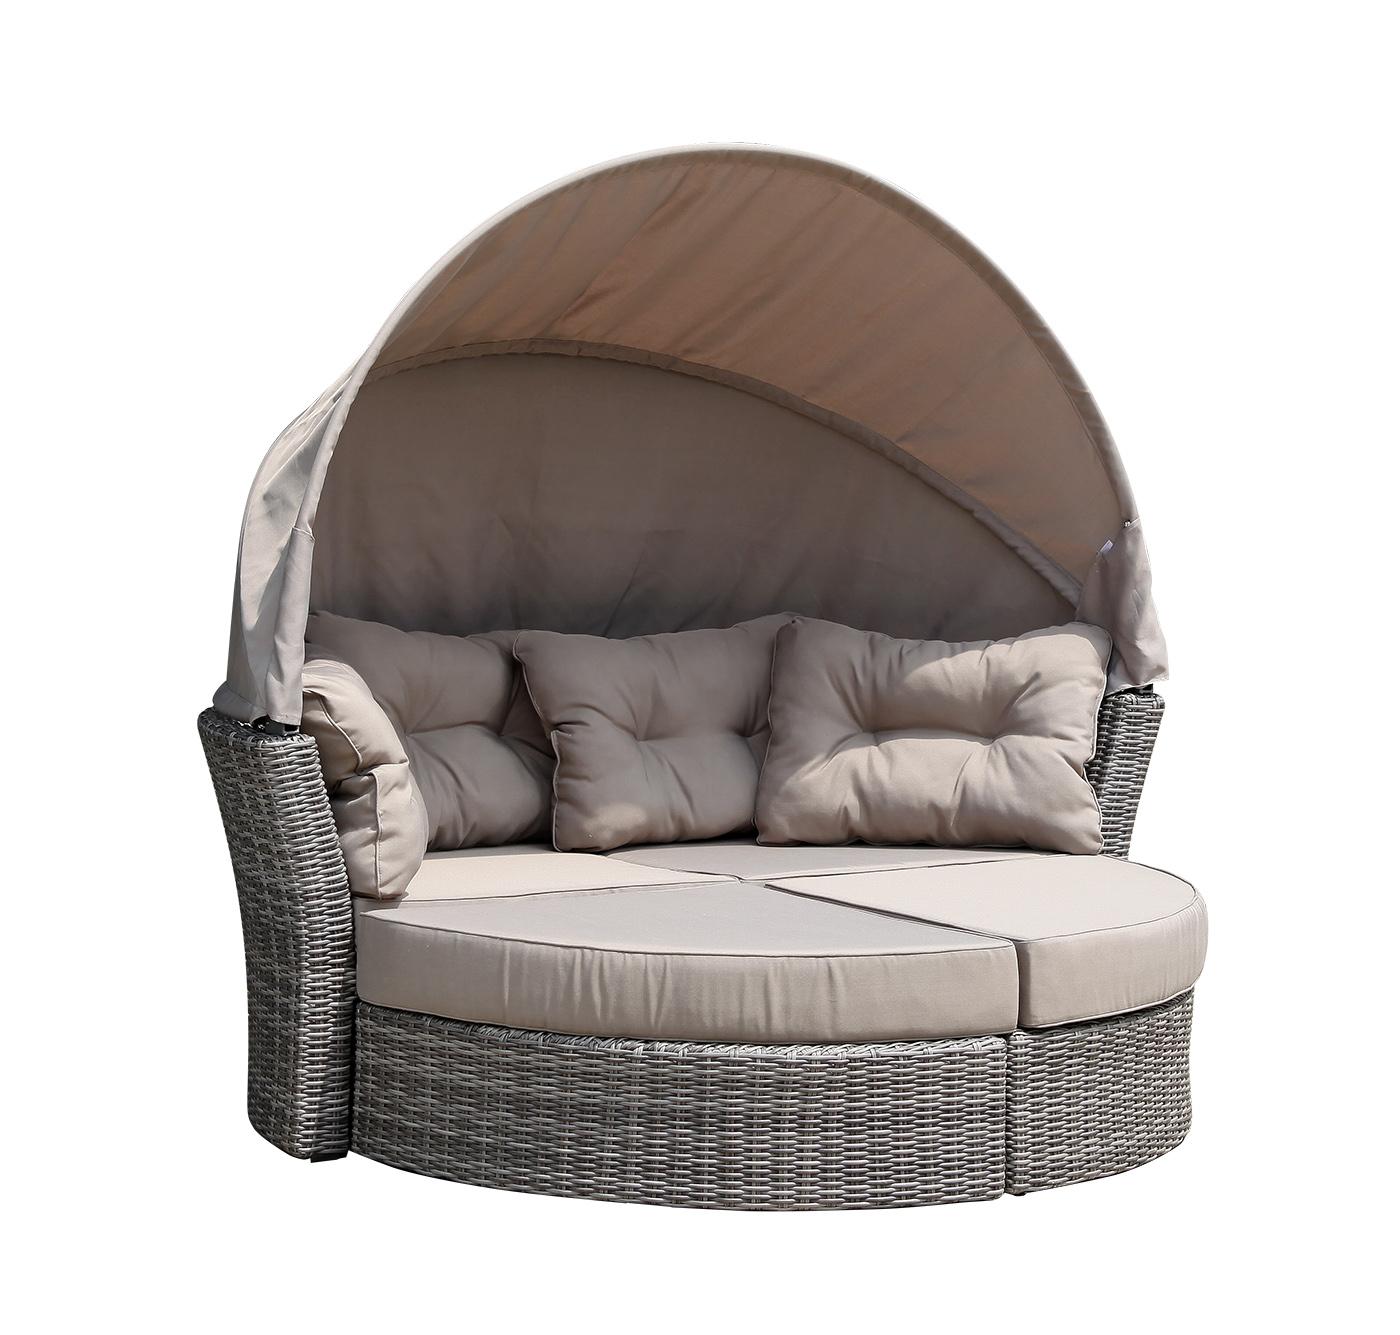 liegeinsel sonneninsel liegemuschel liegesofa marbella. Black Bedroom Furniture Sets. Home Design Ideas